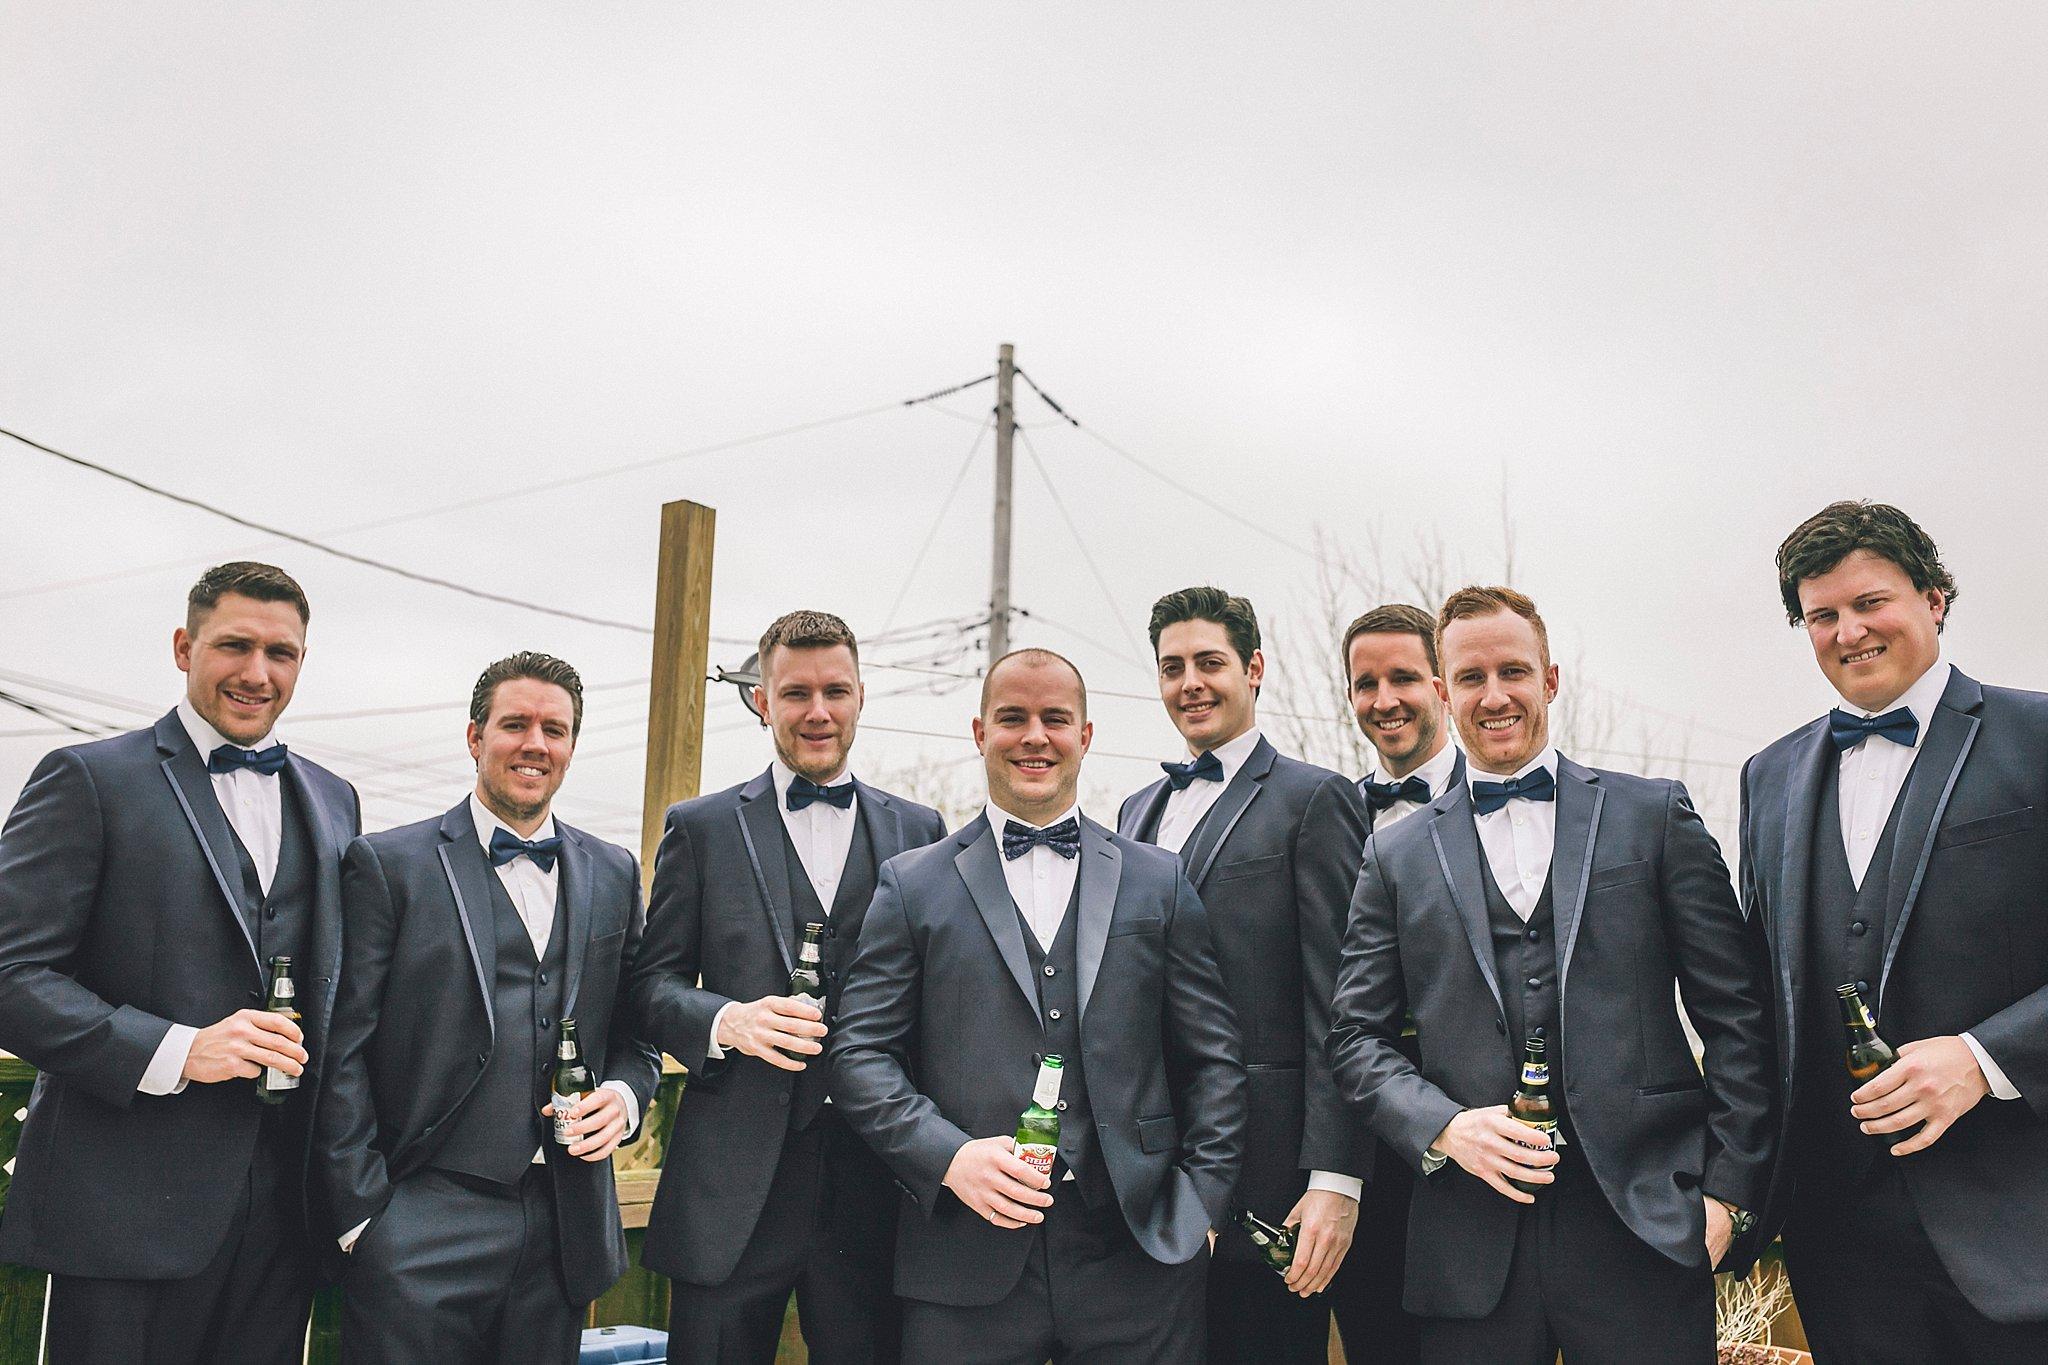 Groom and his groomsmen prepare for their wedding in St. John's, NL